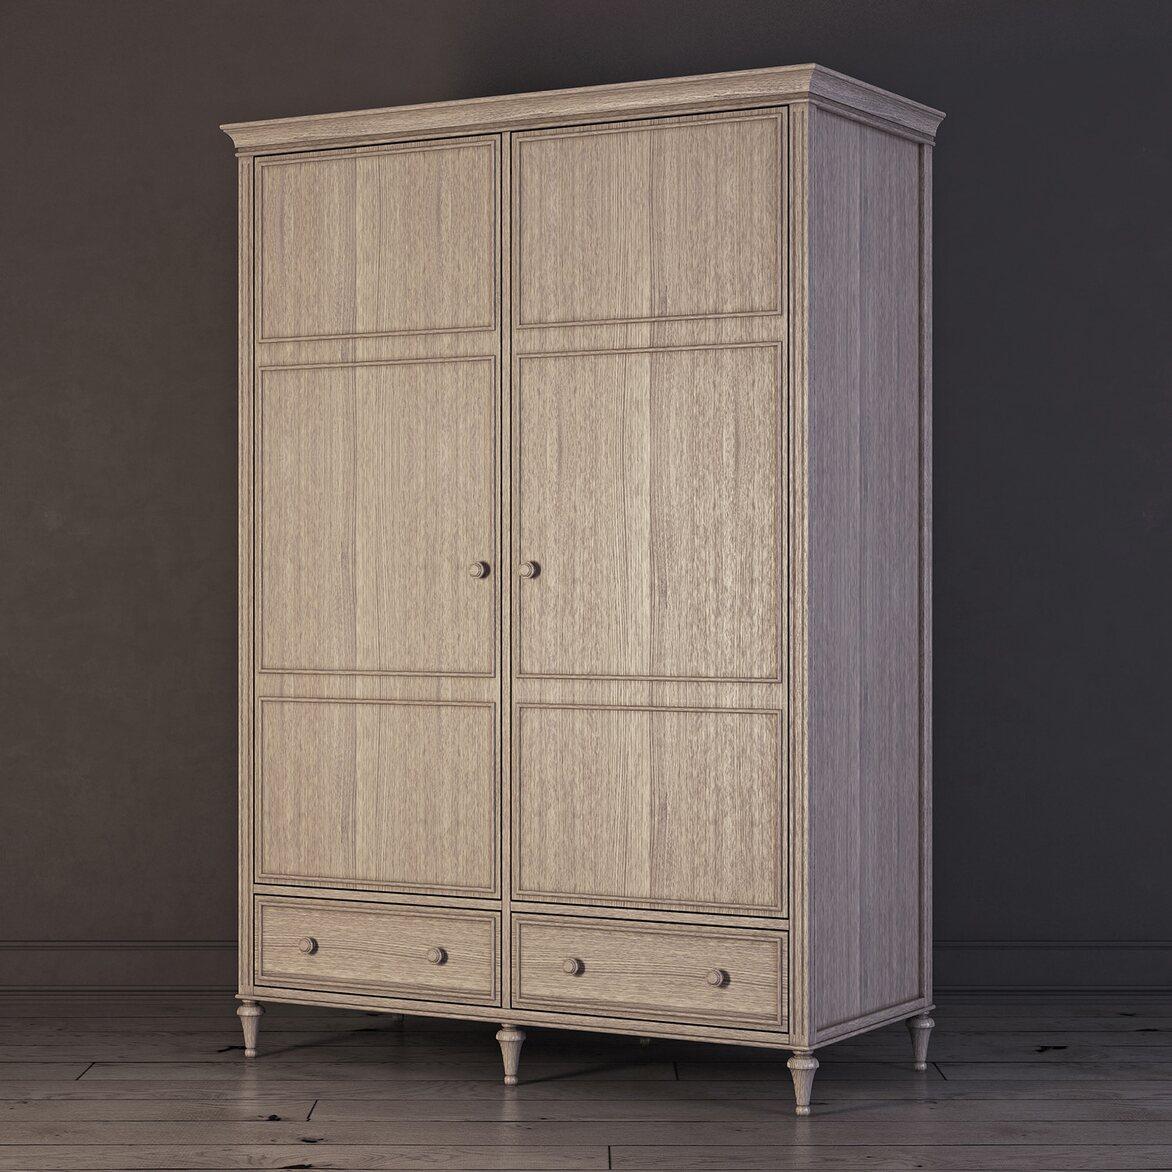 Шкаф двухстворчатый Riverdi, светлый дуб 2 | Платяные шкафы Kingsby